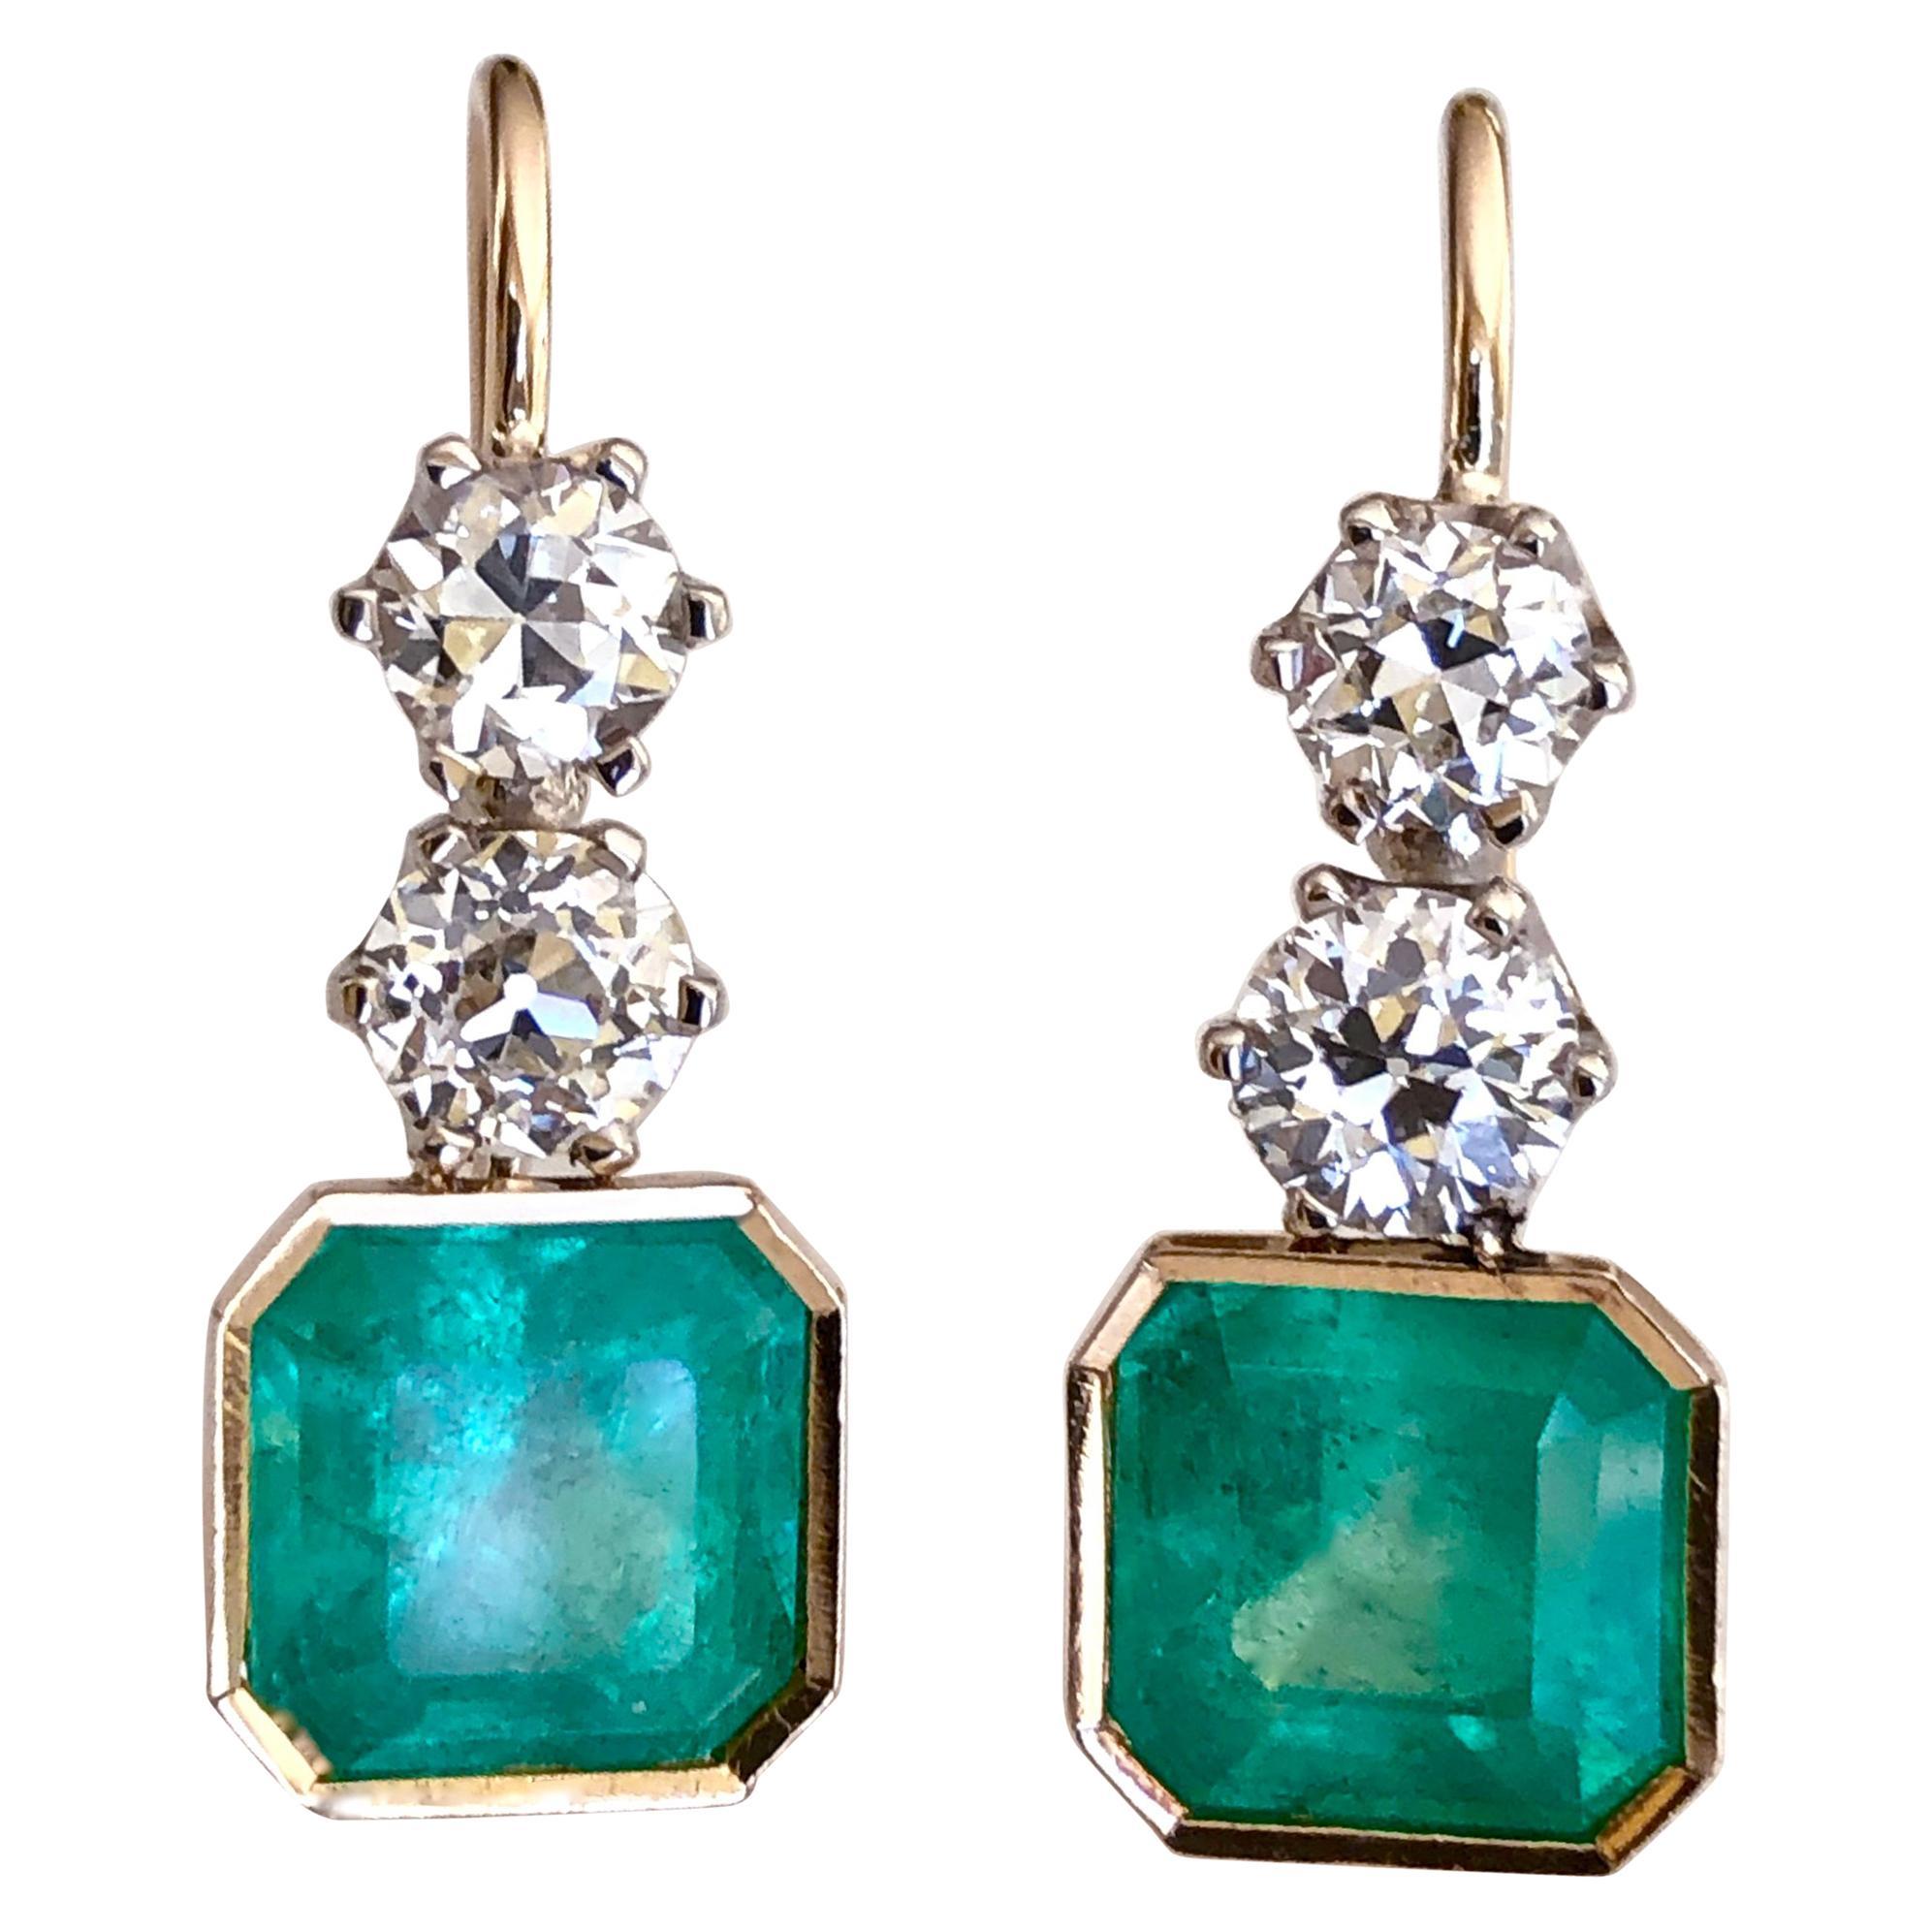 6.60 Carat Colombian Emerald and Old European Diamond Dangle Earrings